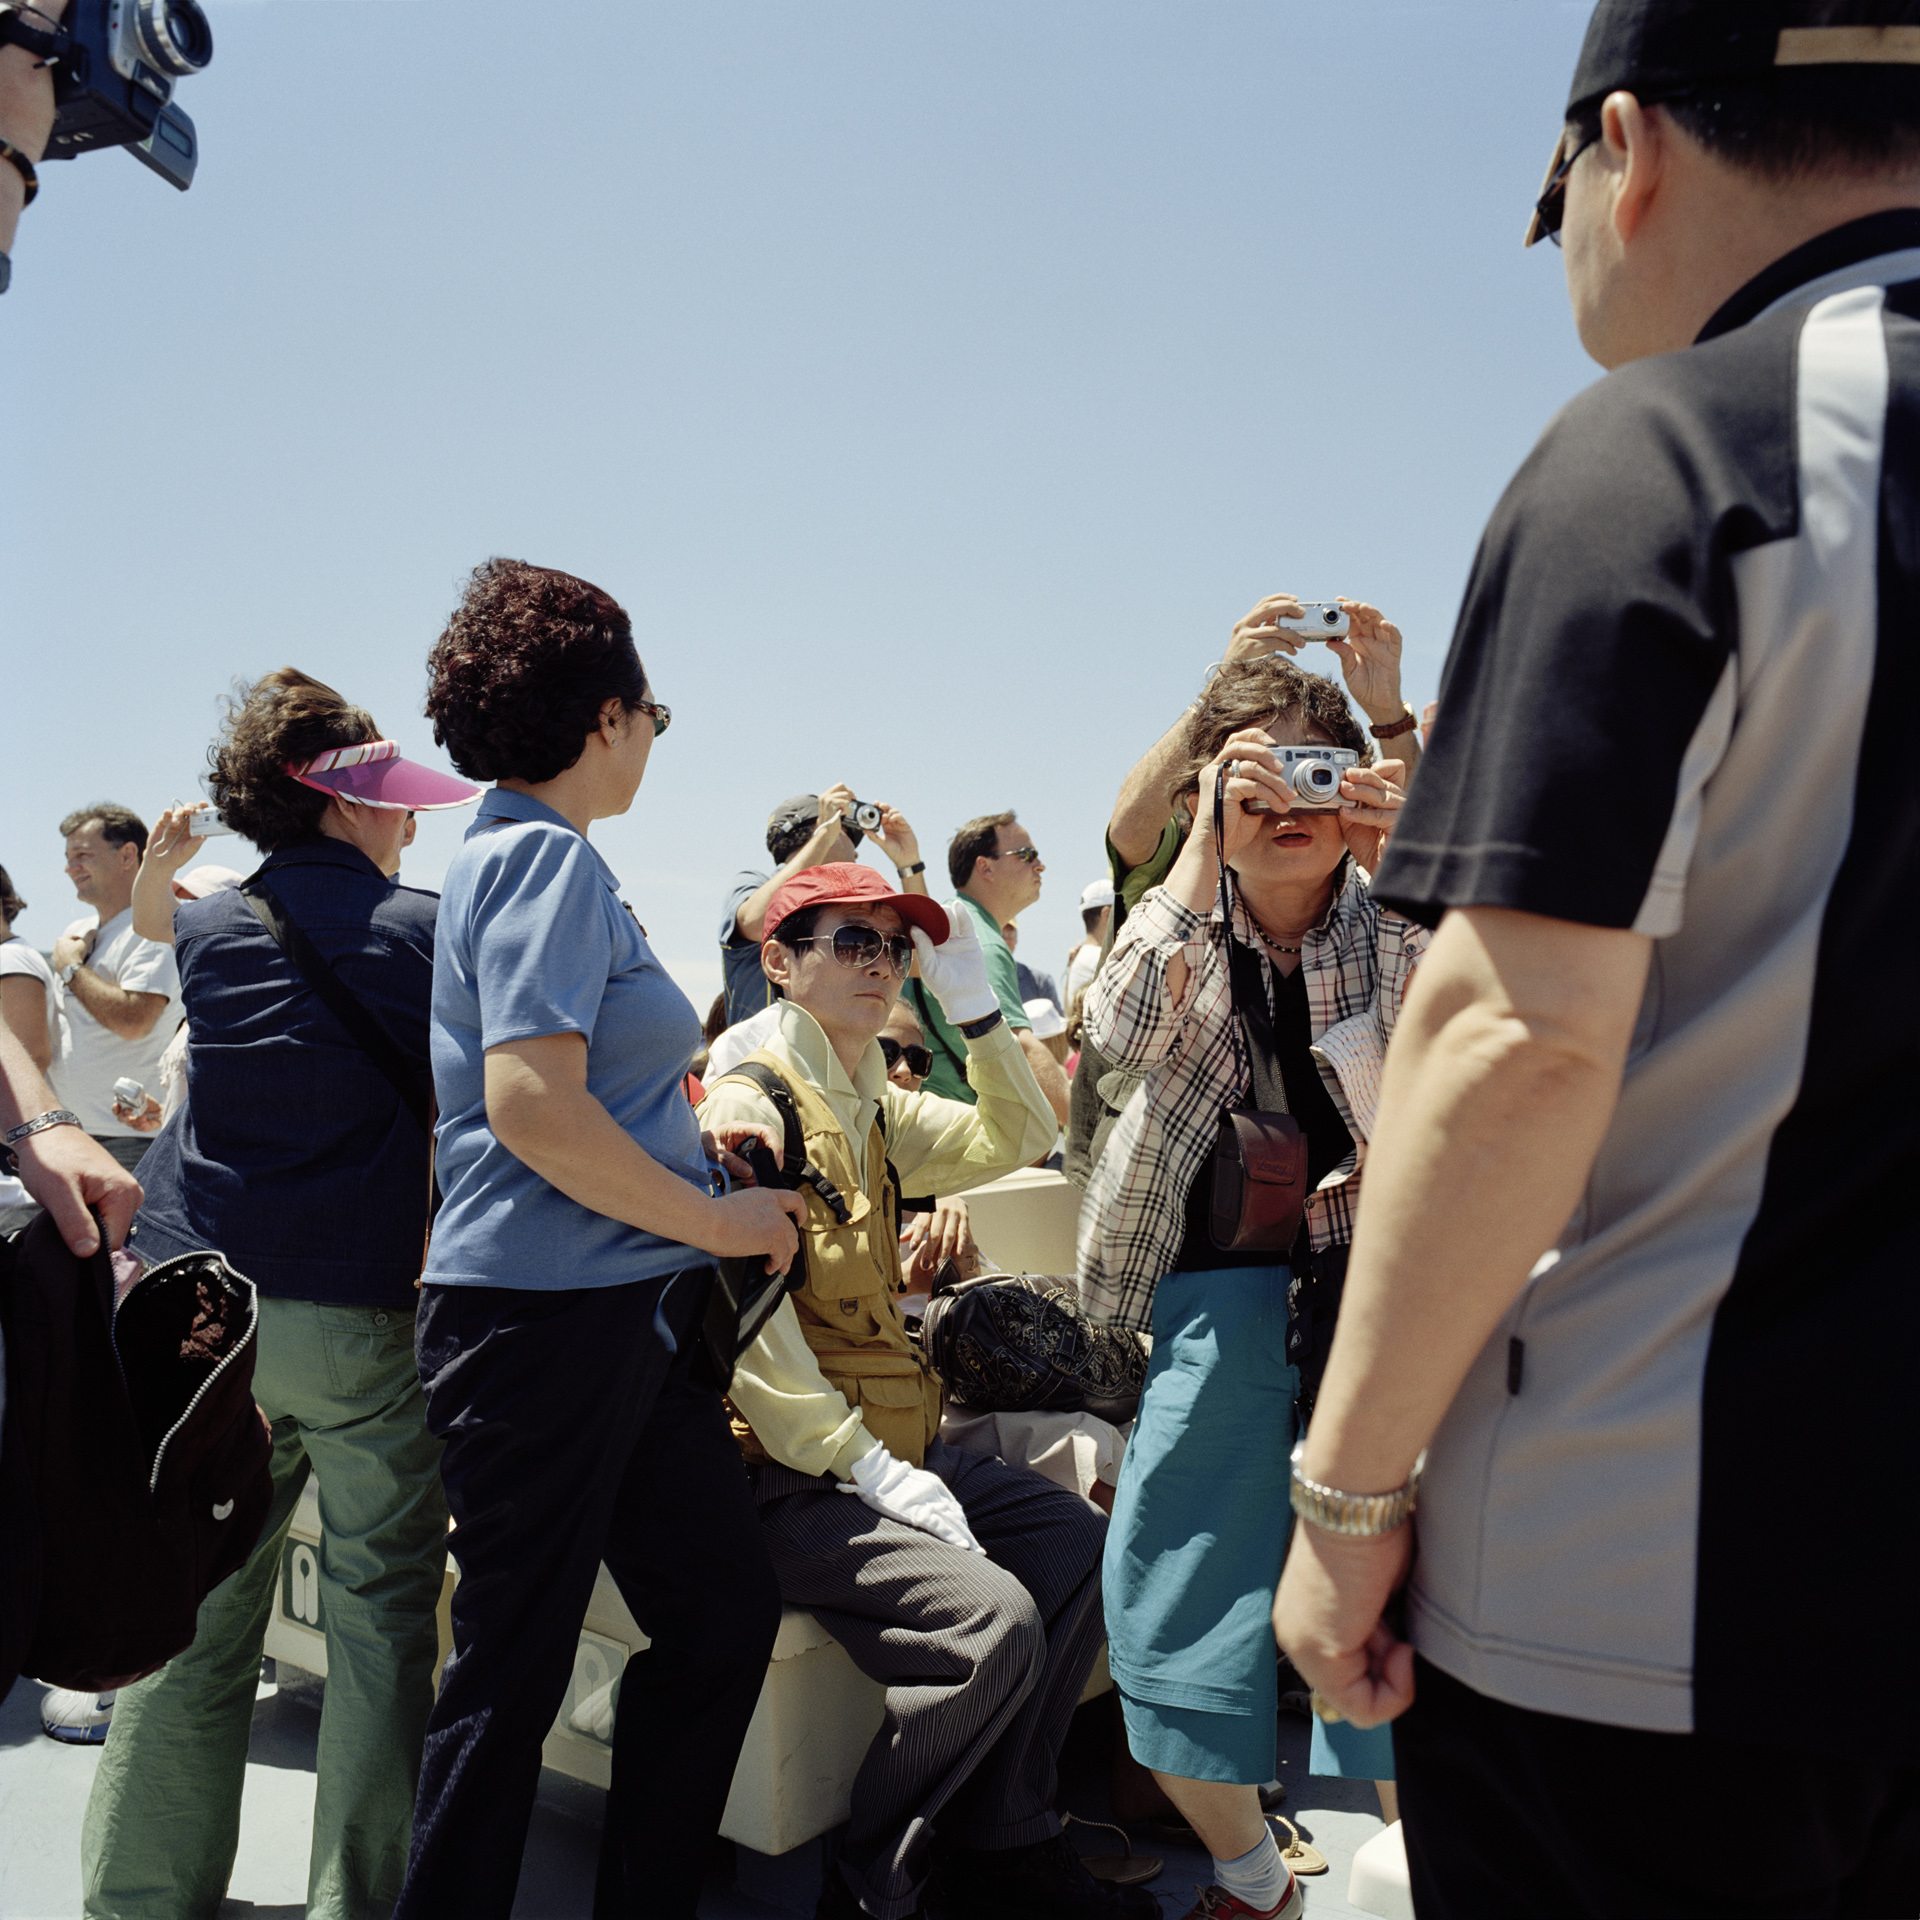 Tourists aboard a ferry headed to the island of Capri.